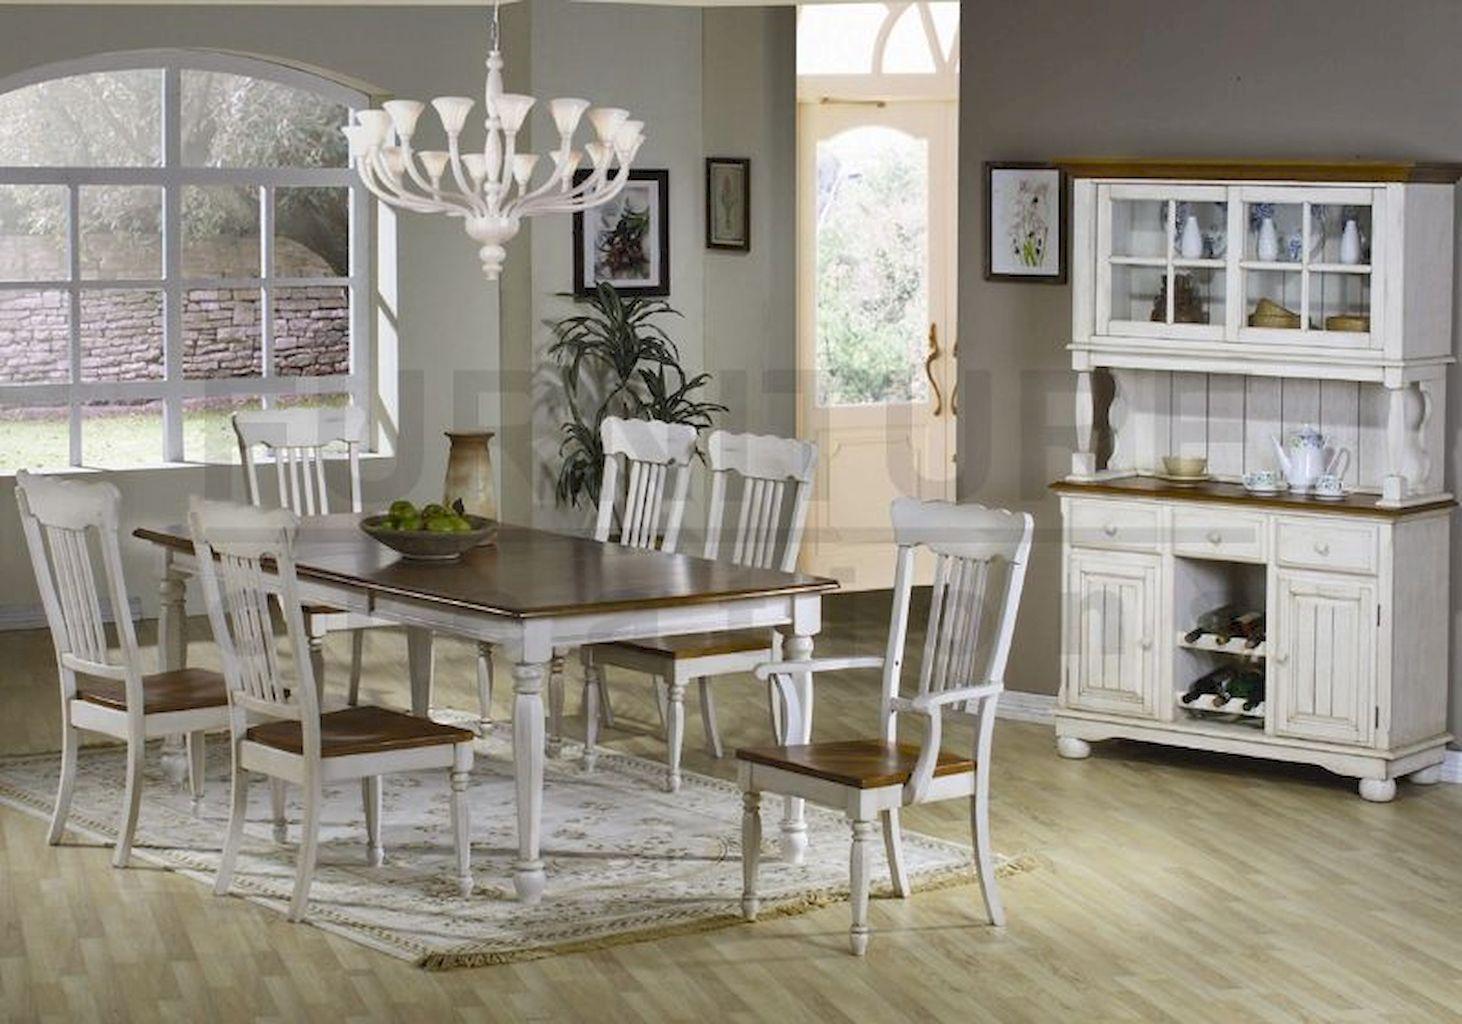 60 rustic farmhouse dining room table decor ideas and